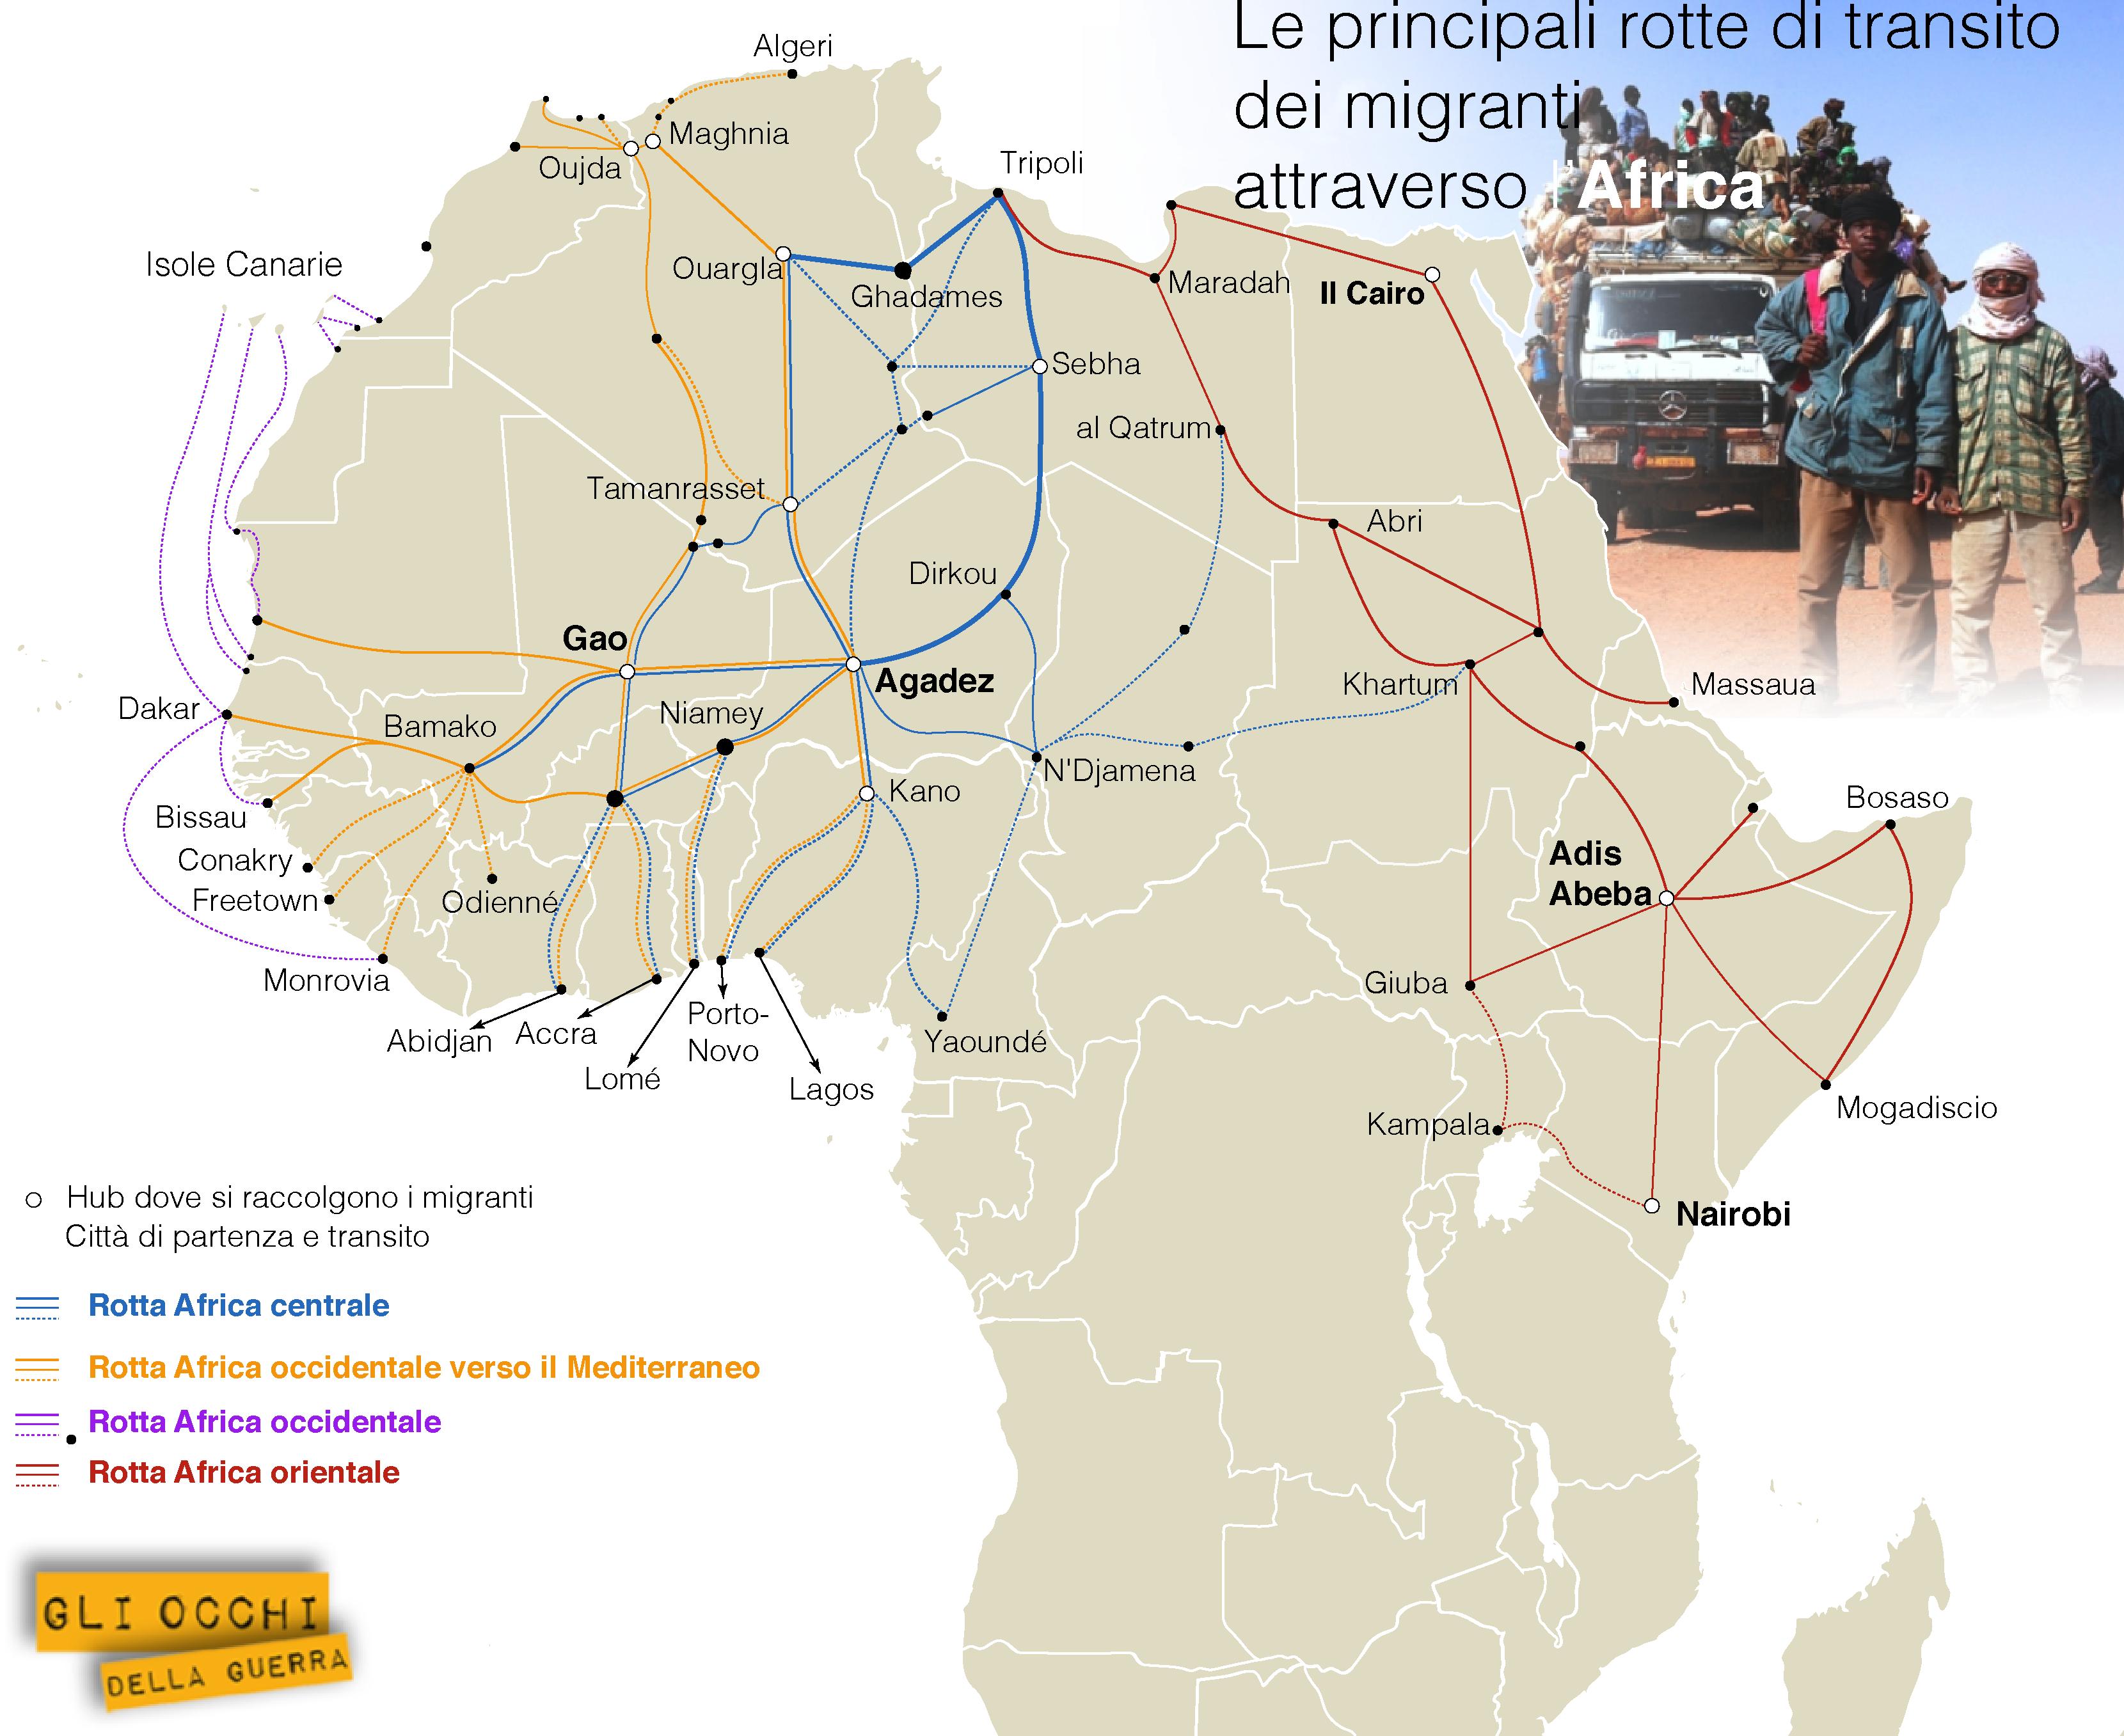 rotte migranti africa